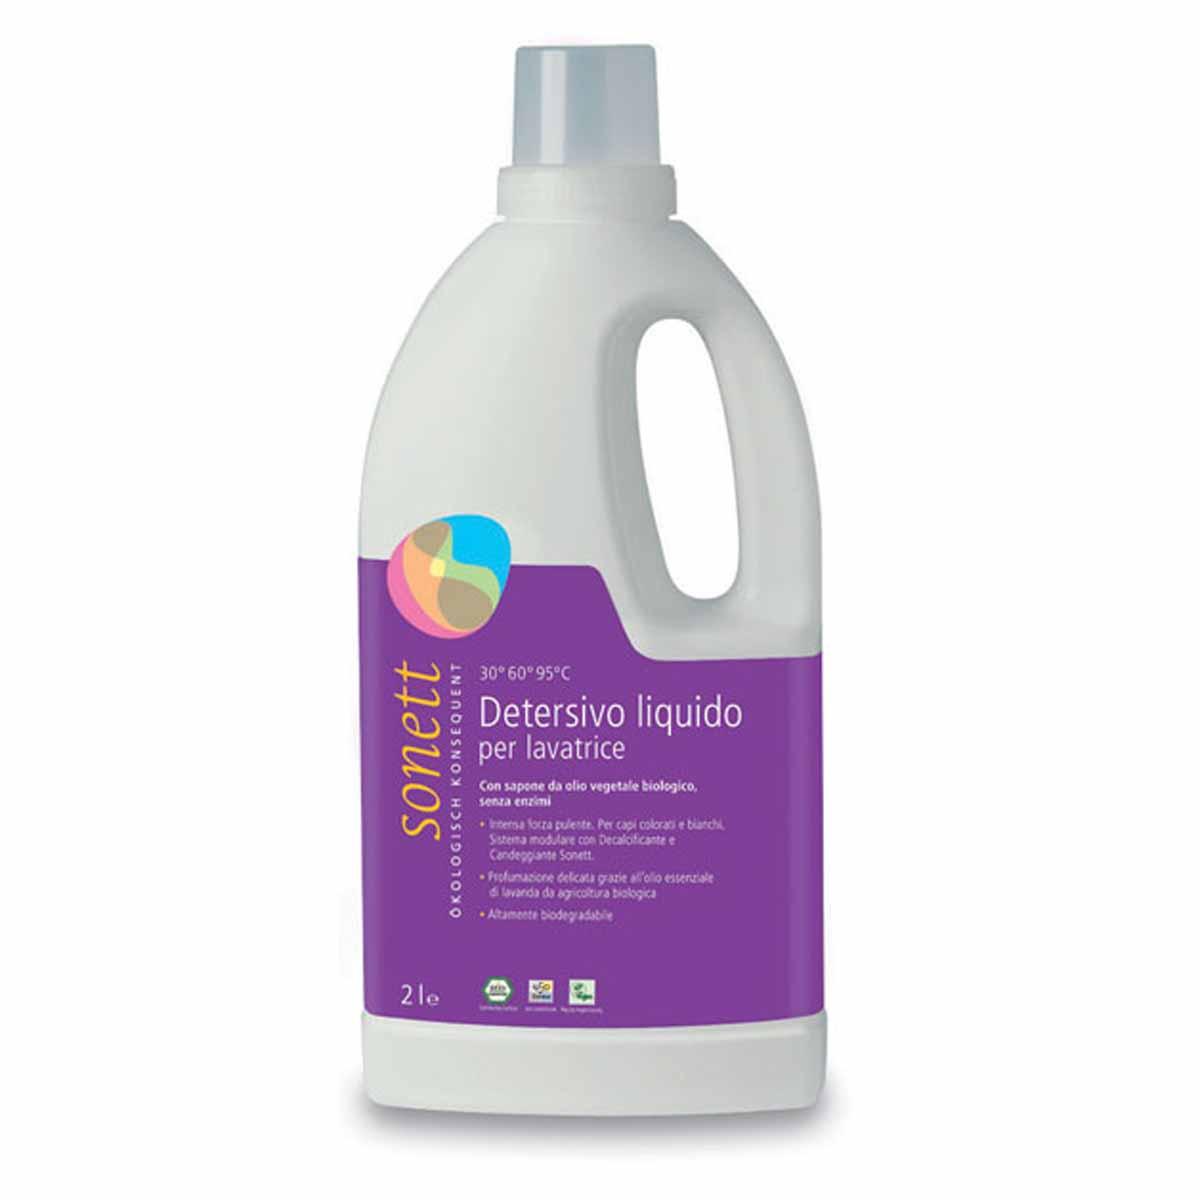 Sonett Detersivo liquido per lavatrice